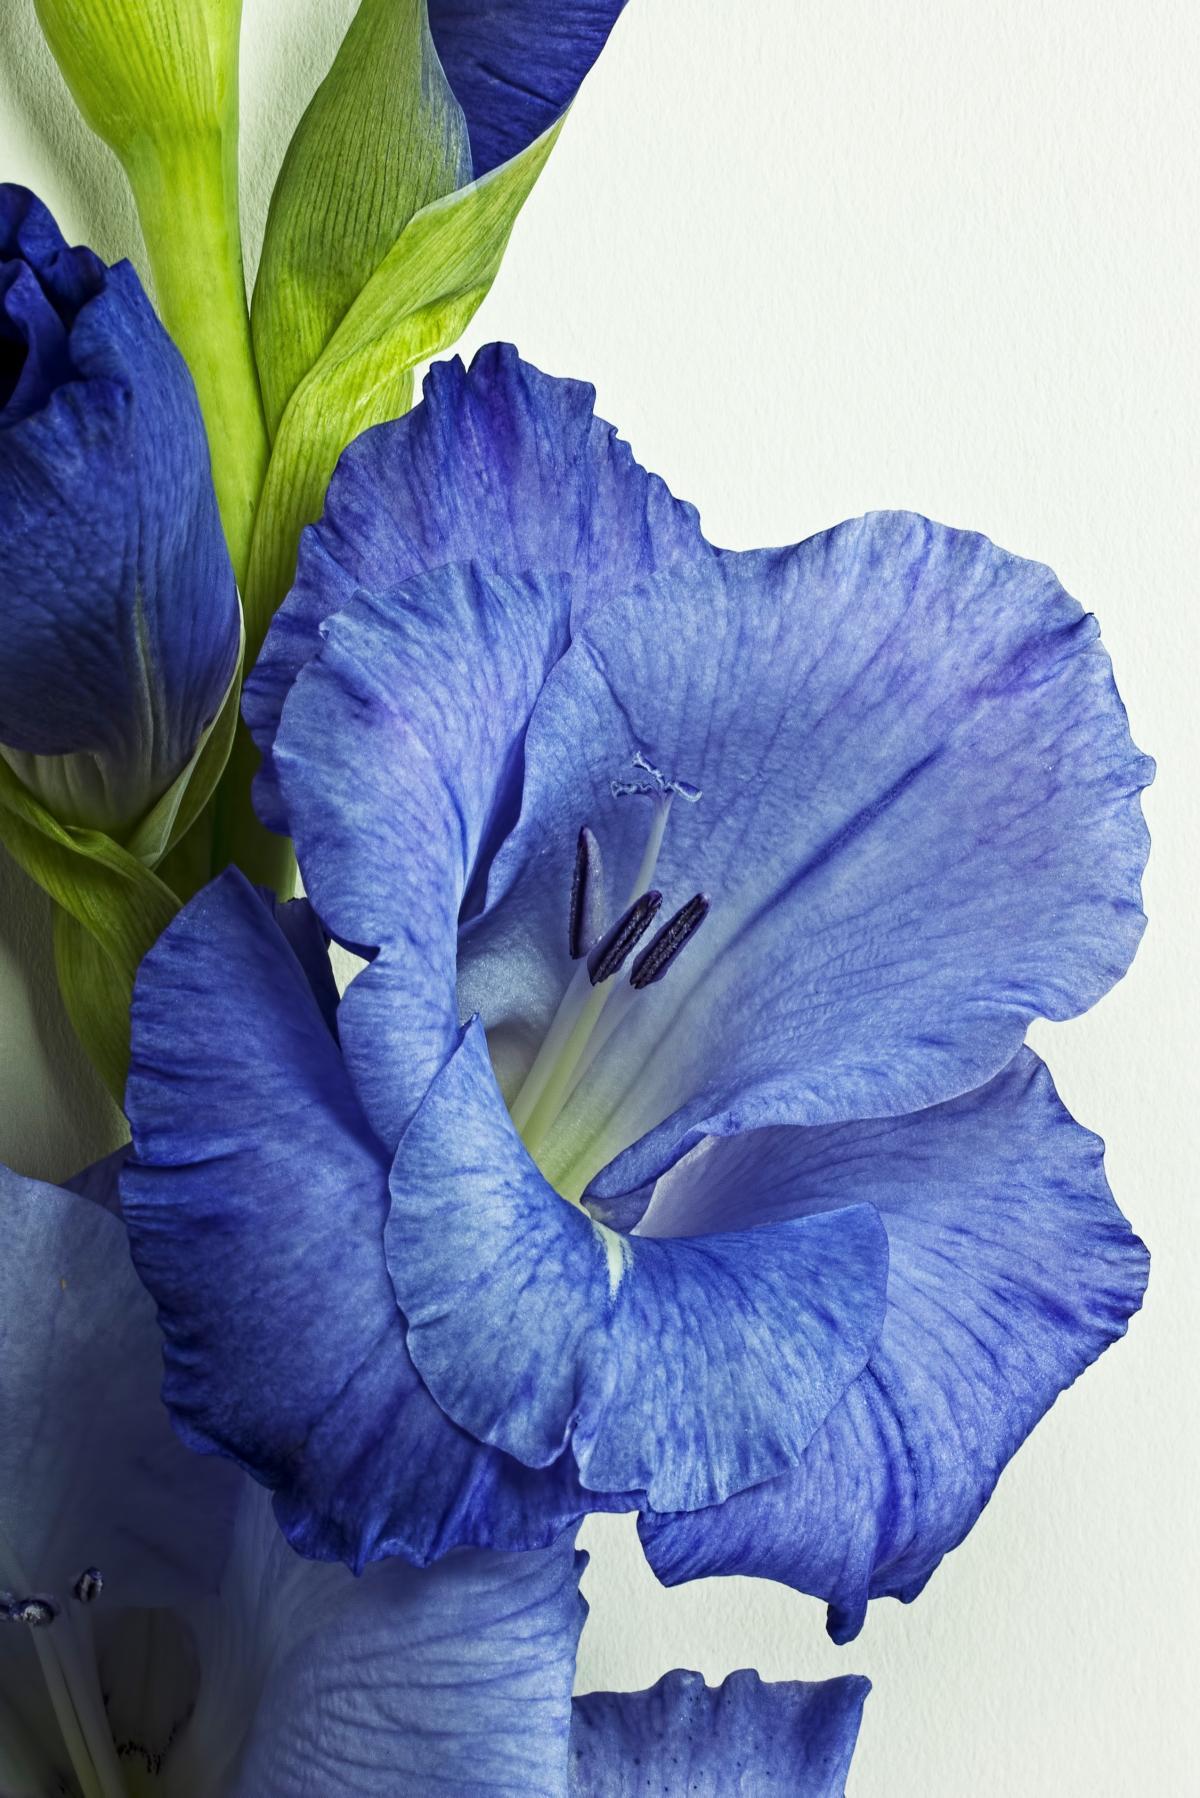 Close up flower flowers gladiolus